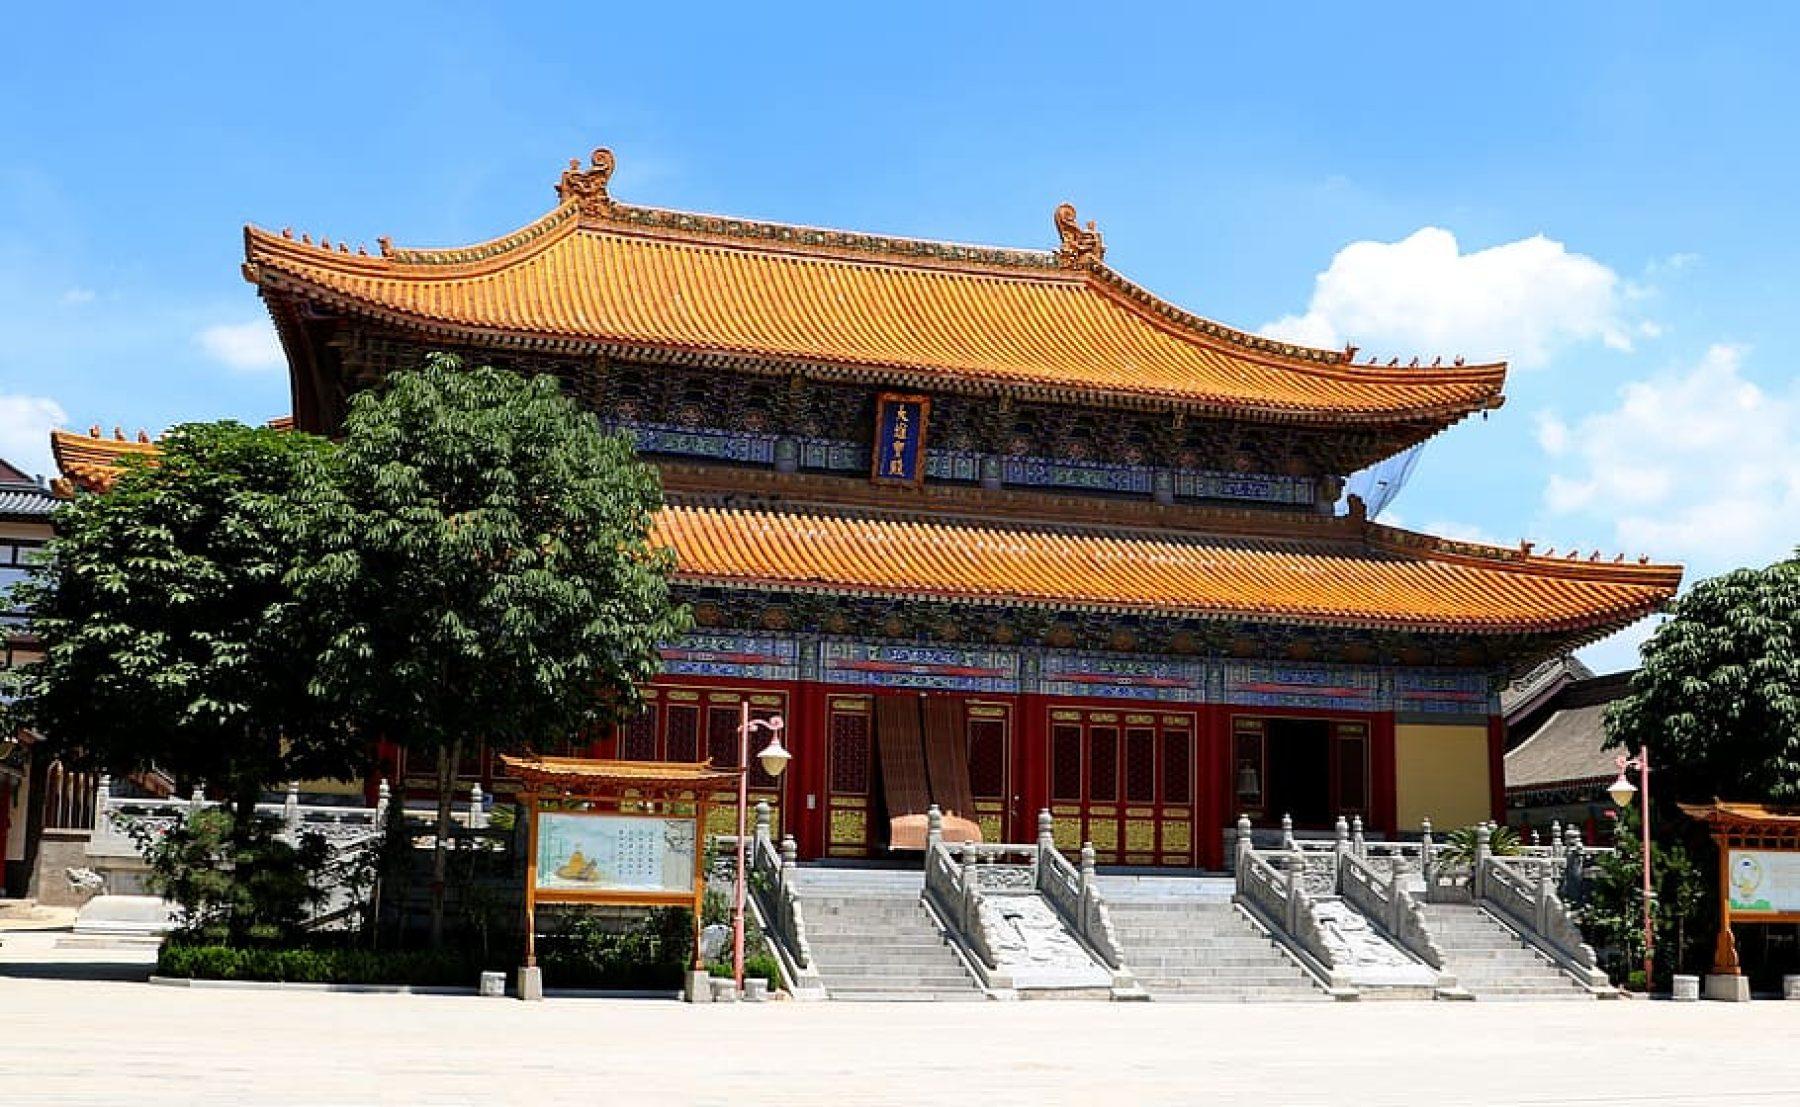 Nehalennia Tempel